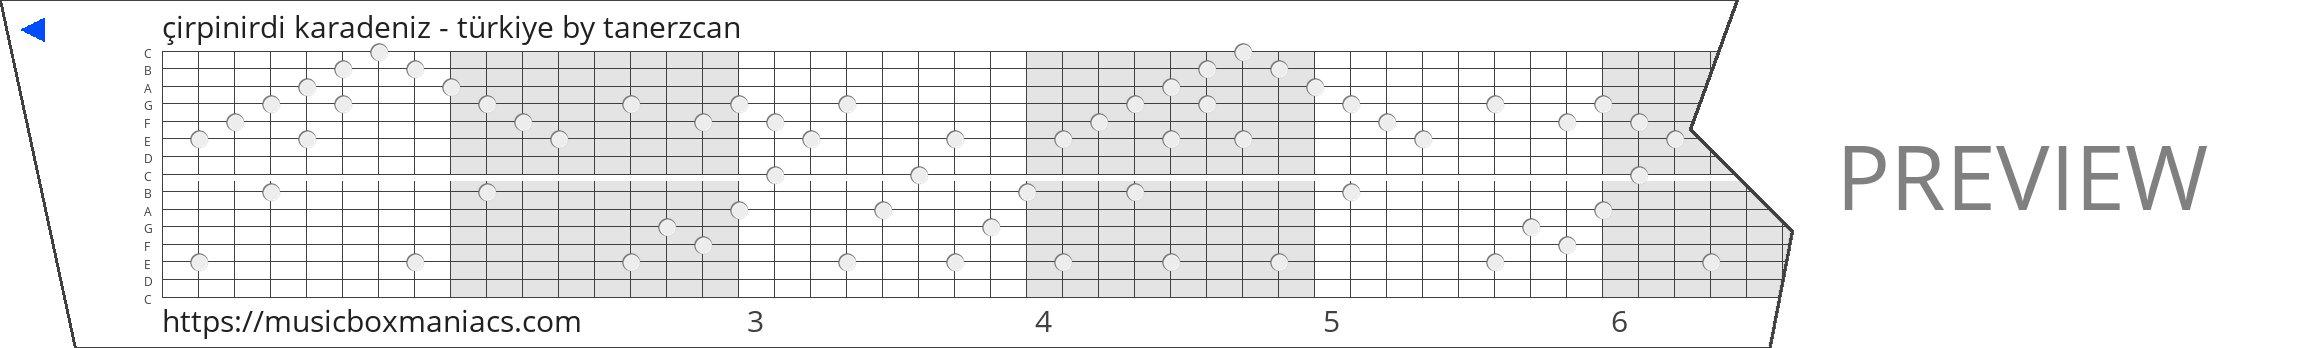 çirpinirdi karadeniz - türkiye 15 note music box paper strip